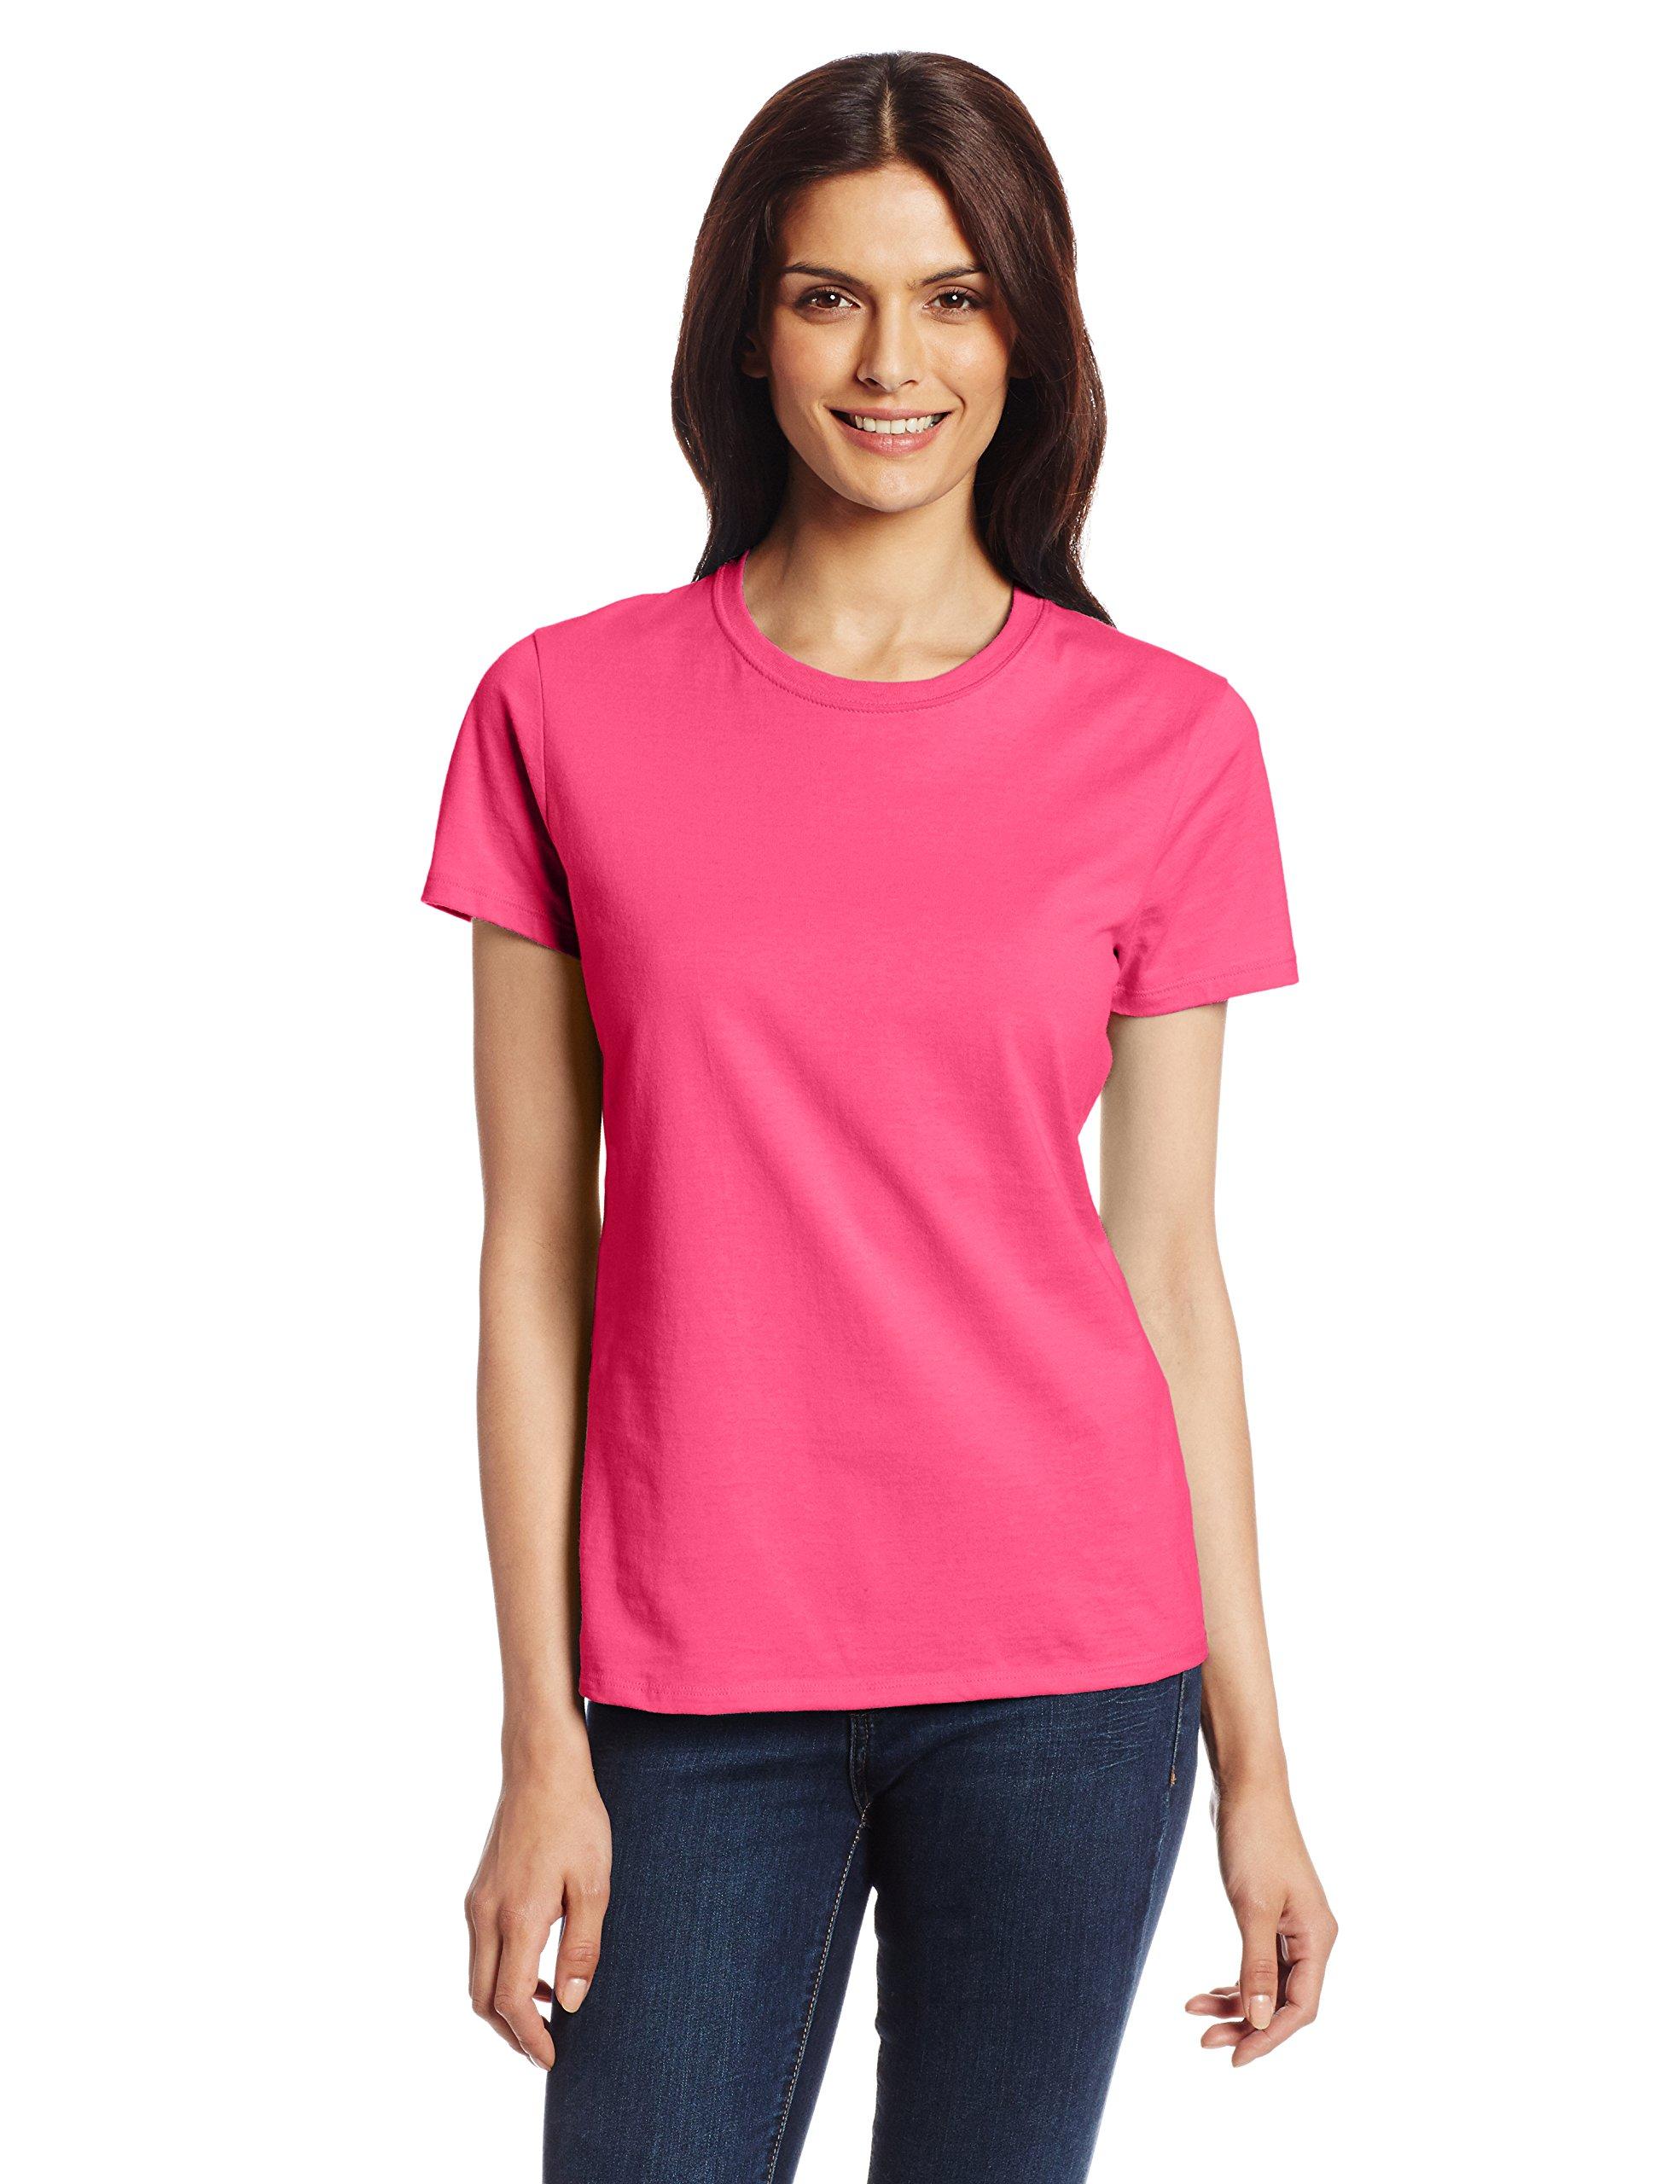 3811e893 Galleon - Hanes Women's Nano T-Shirt, Large, Wow Pink